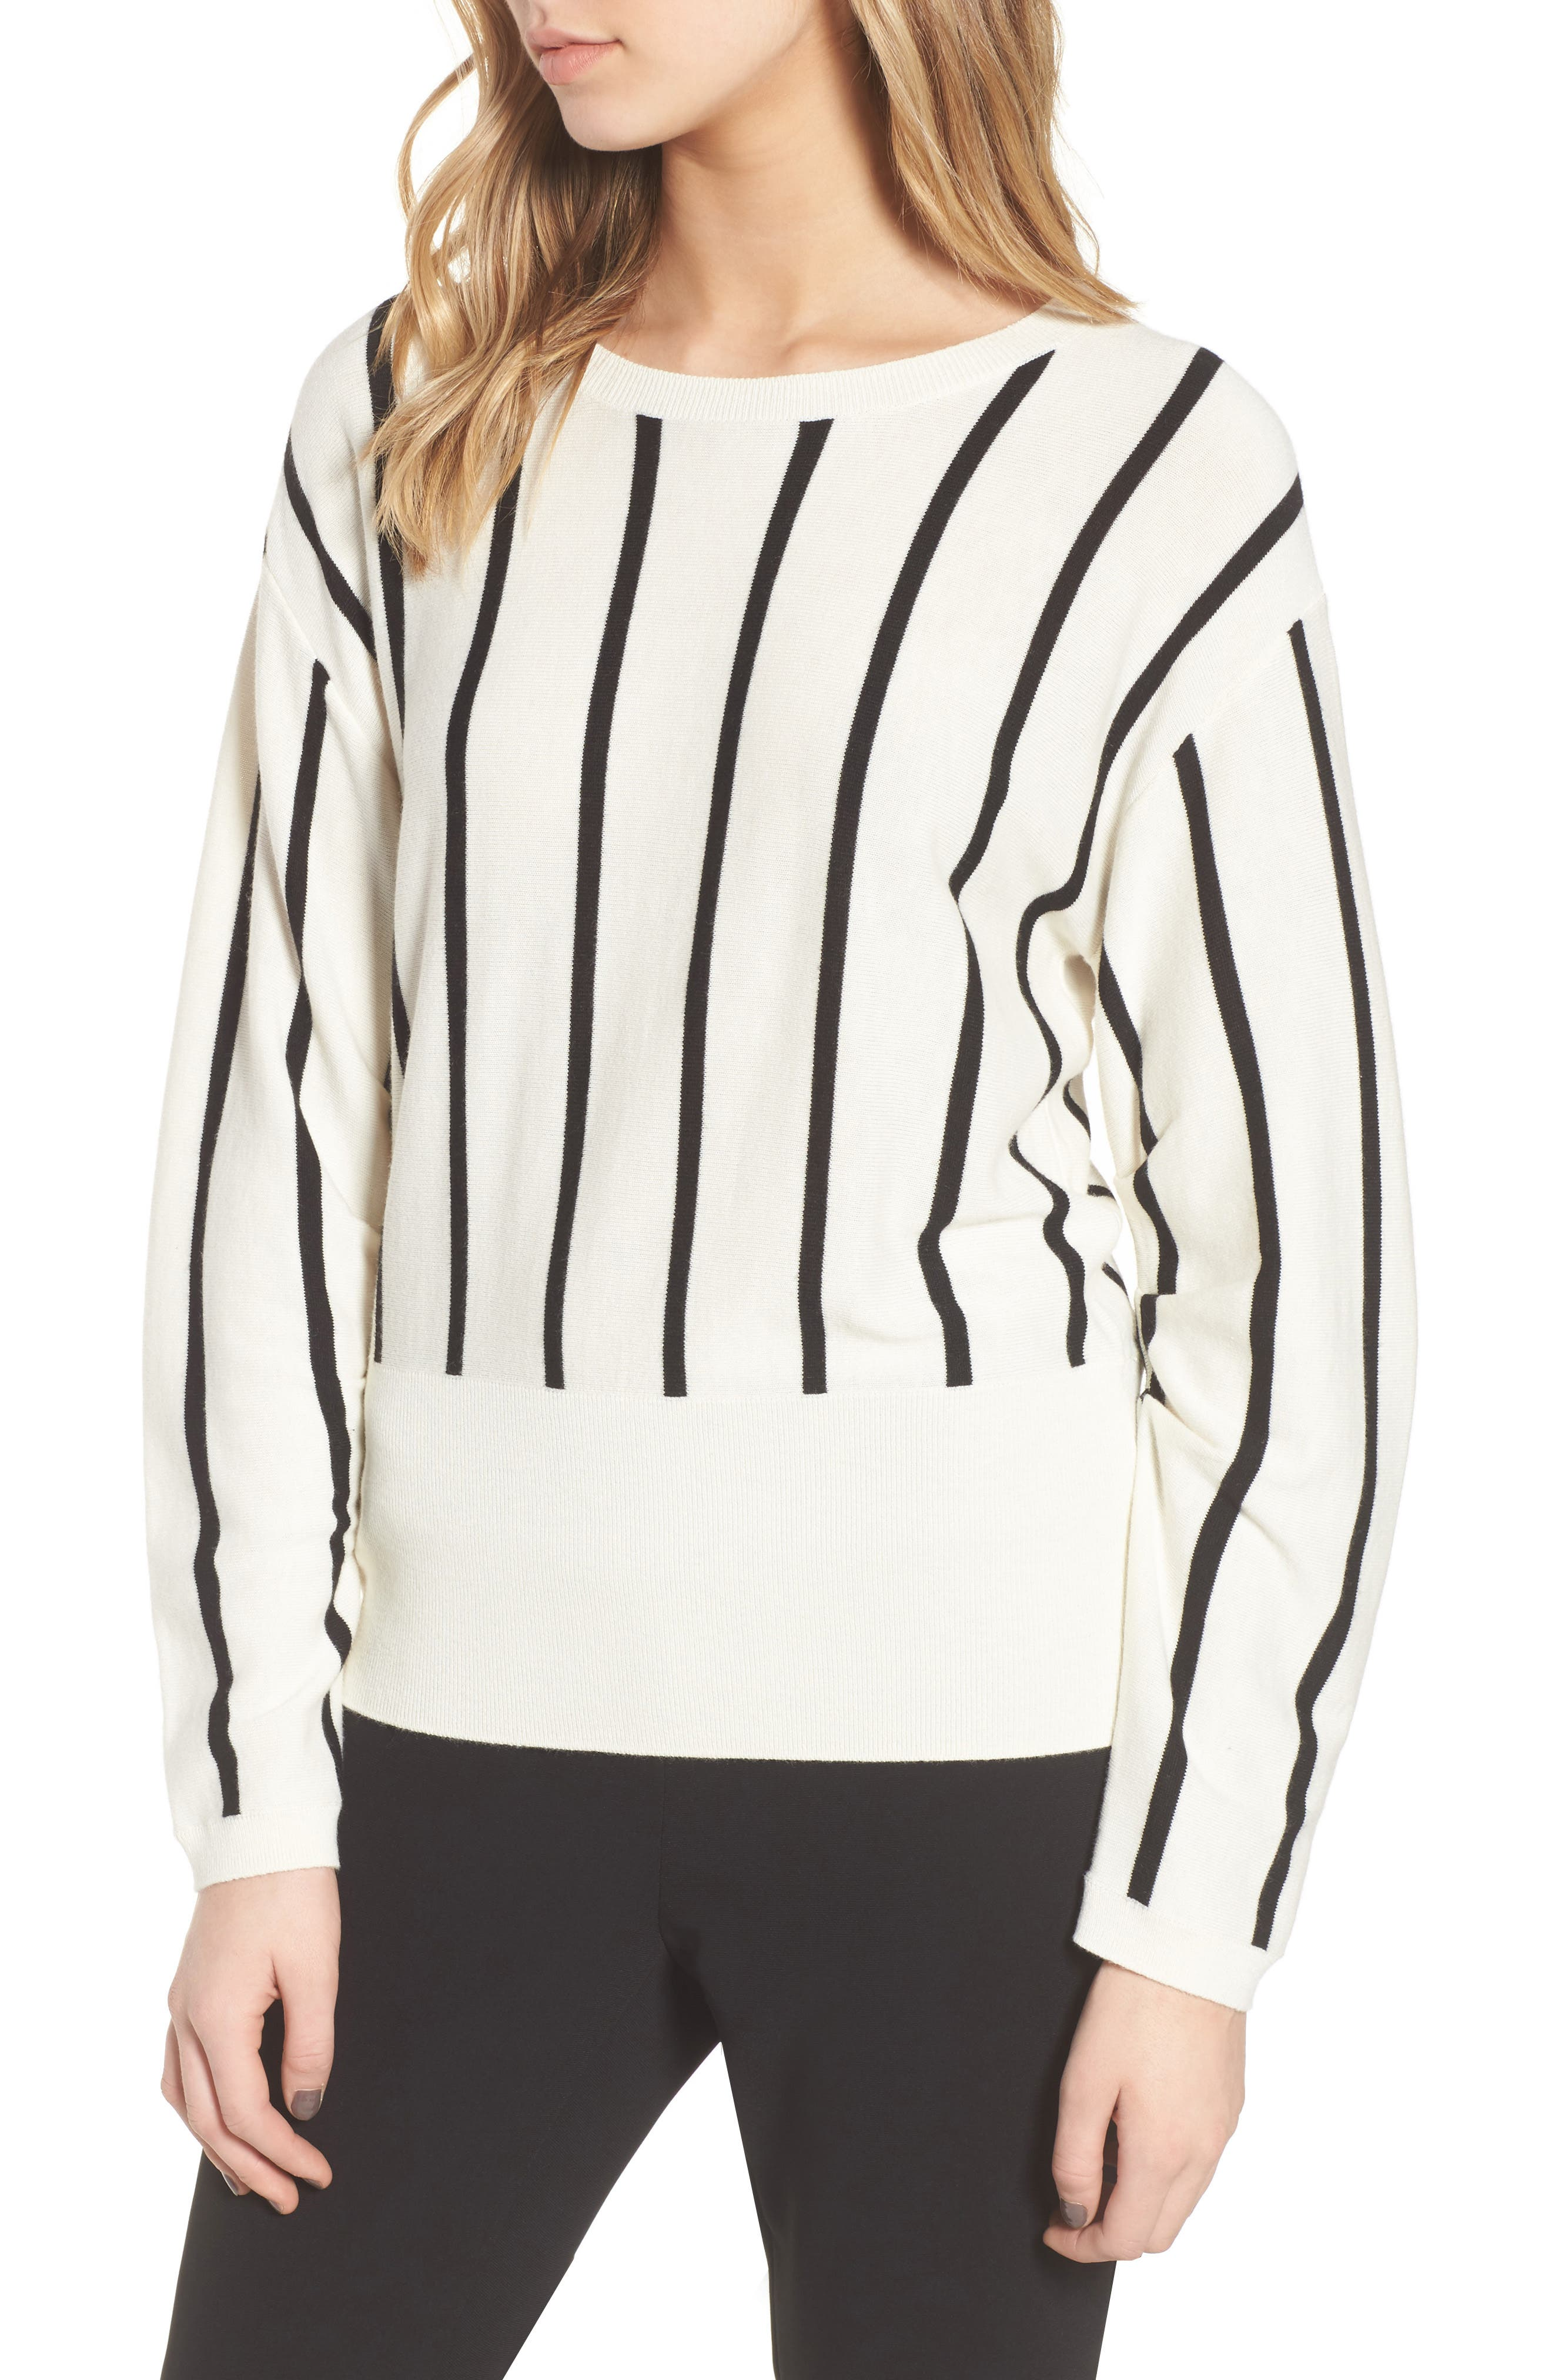 Vertical Stripe Sweater,                             Main thumbnail 1, color,                             Ivory/ Black Becky Stripe